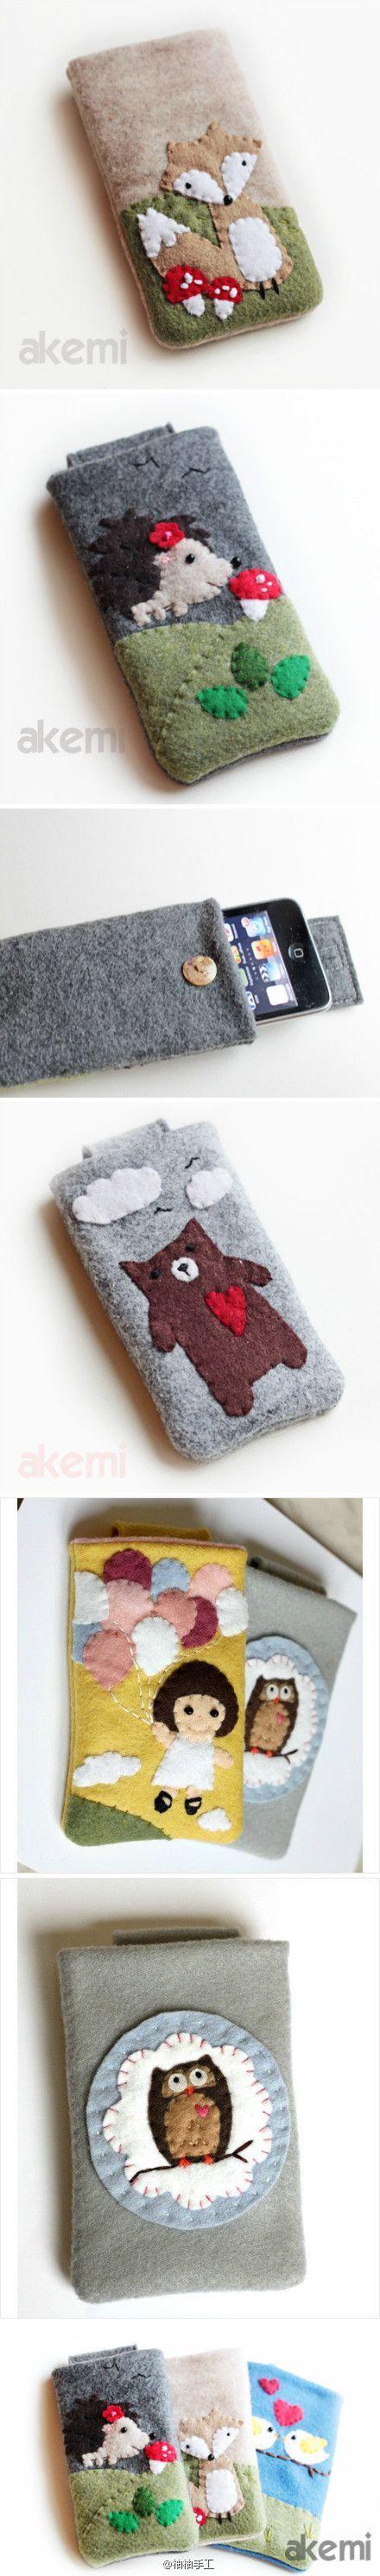 Cute felt patch iphone sets: